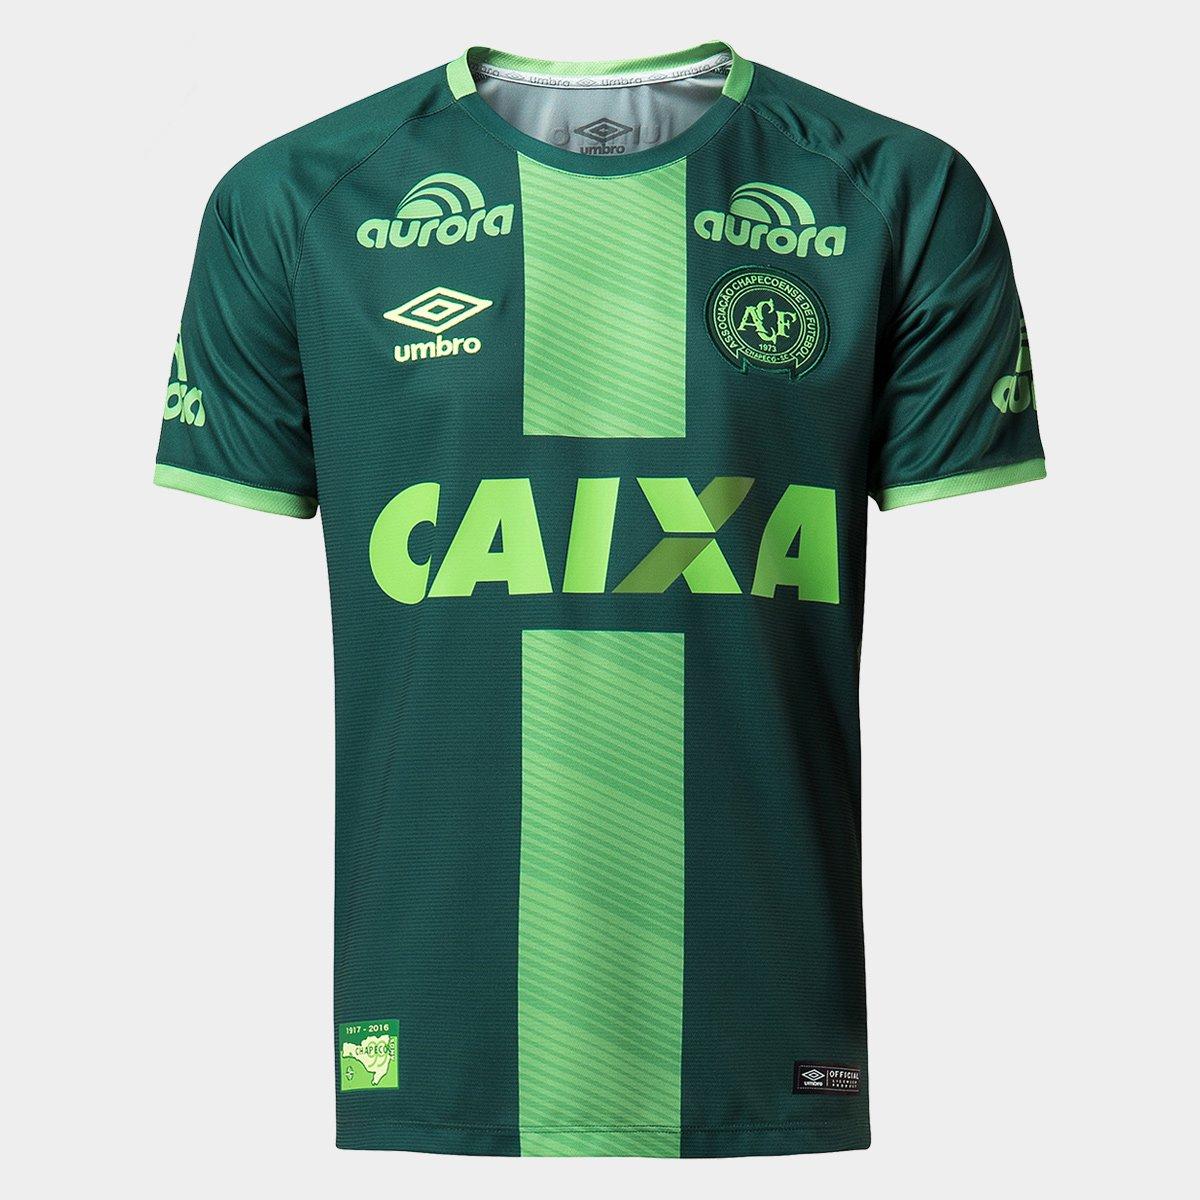 b94ae7a575 Camisa Chapecoense III 16/17 s/nº Torcedor Umbro Masculina - Verde | Loja  da Chape